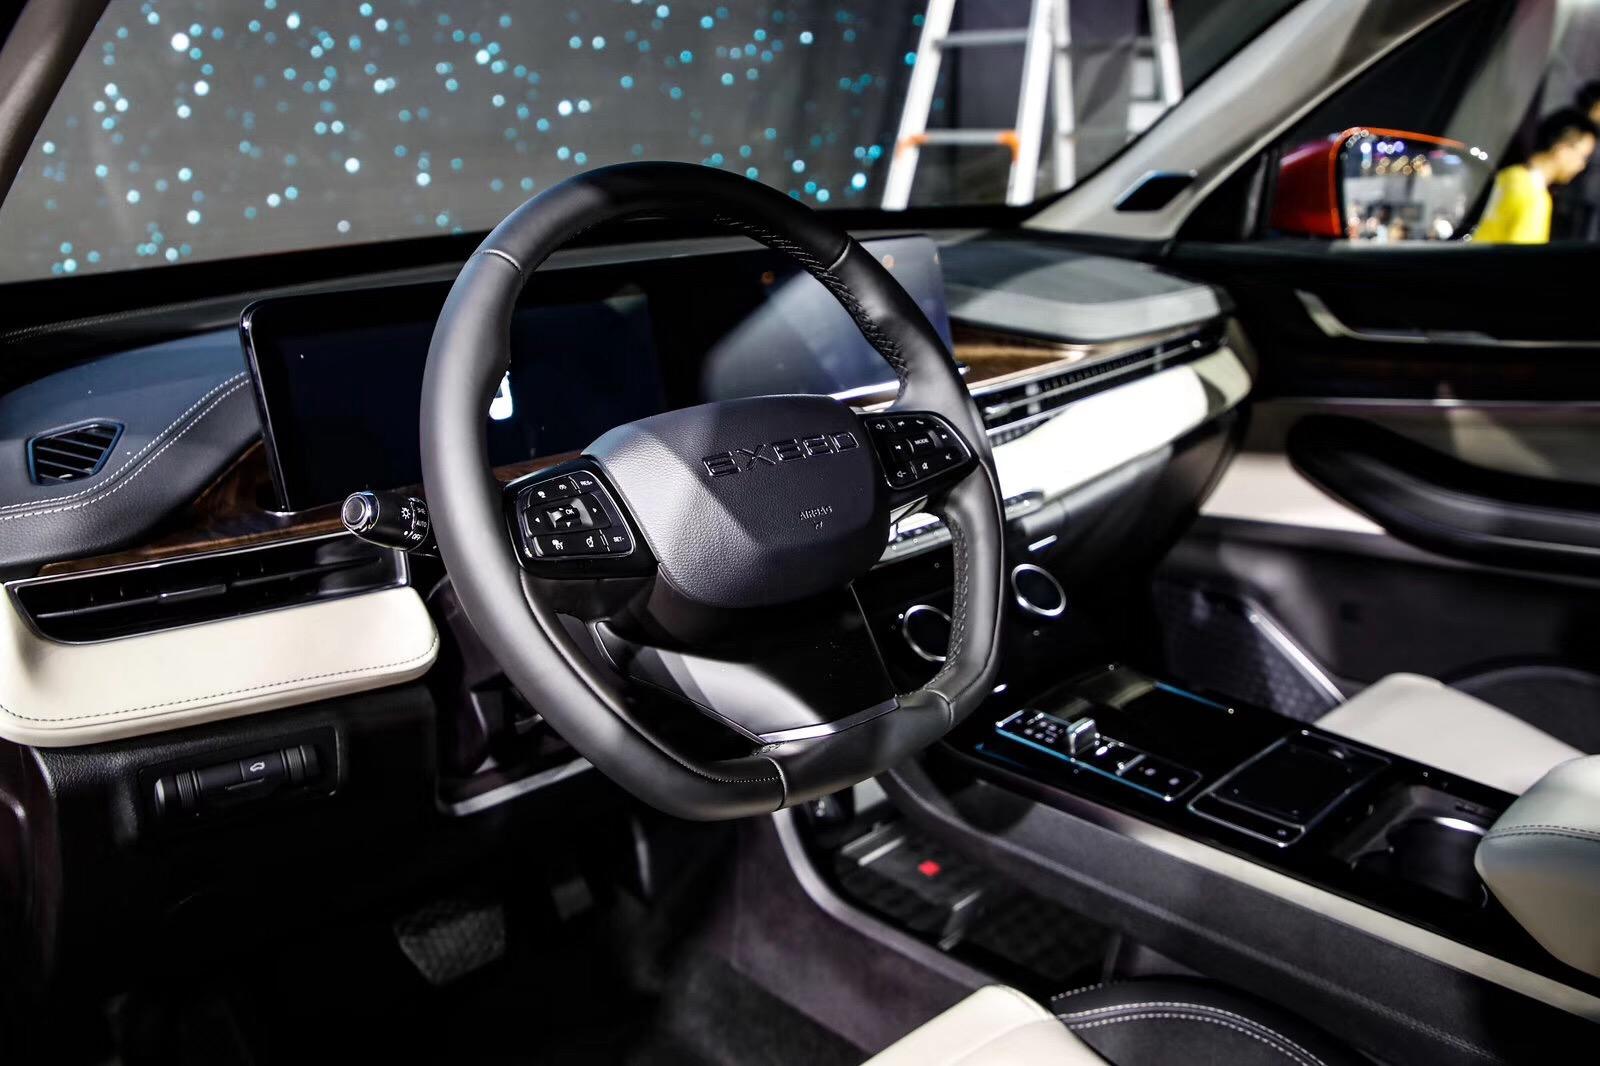 EXEED星途LX成都车展全球首发预售12.79万起